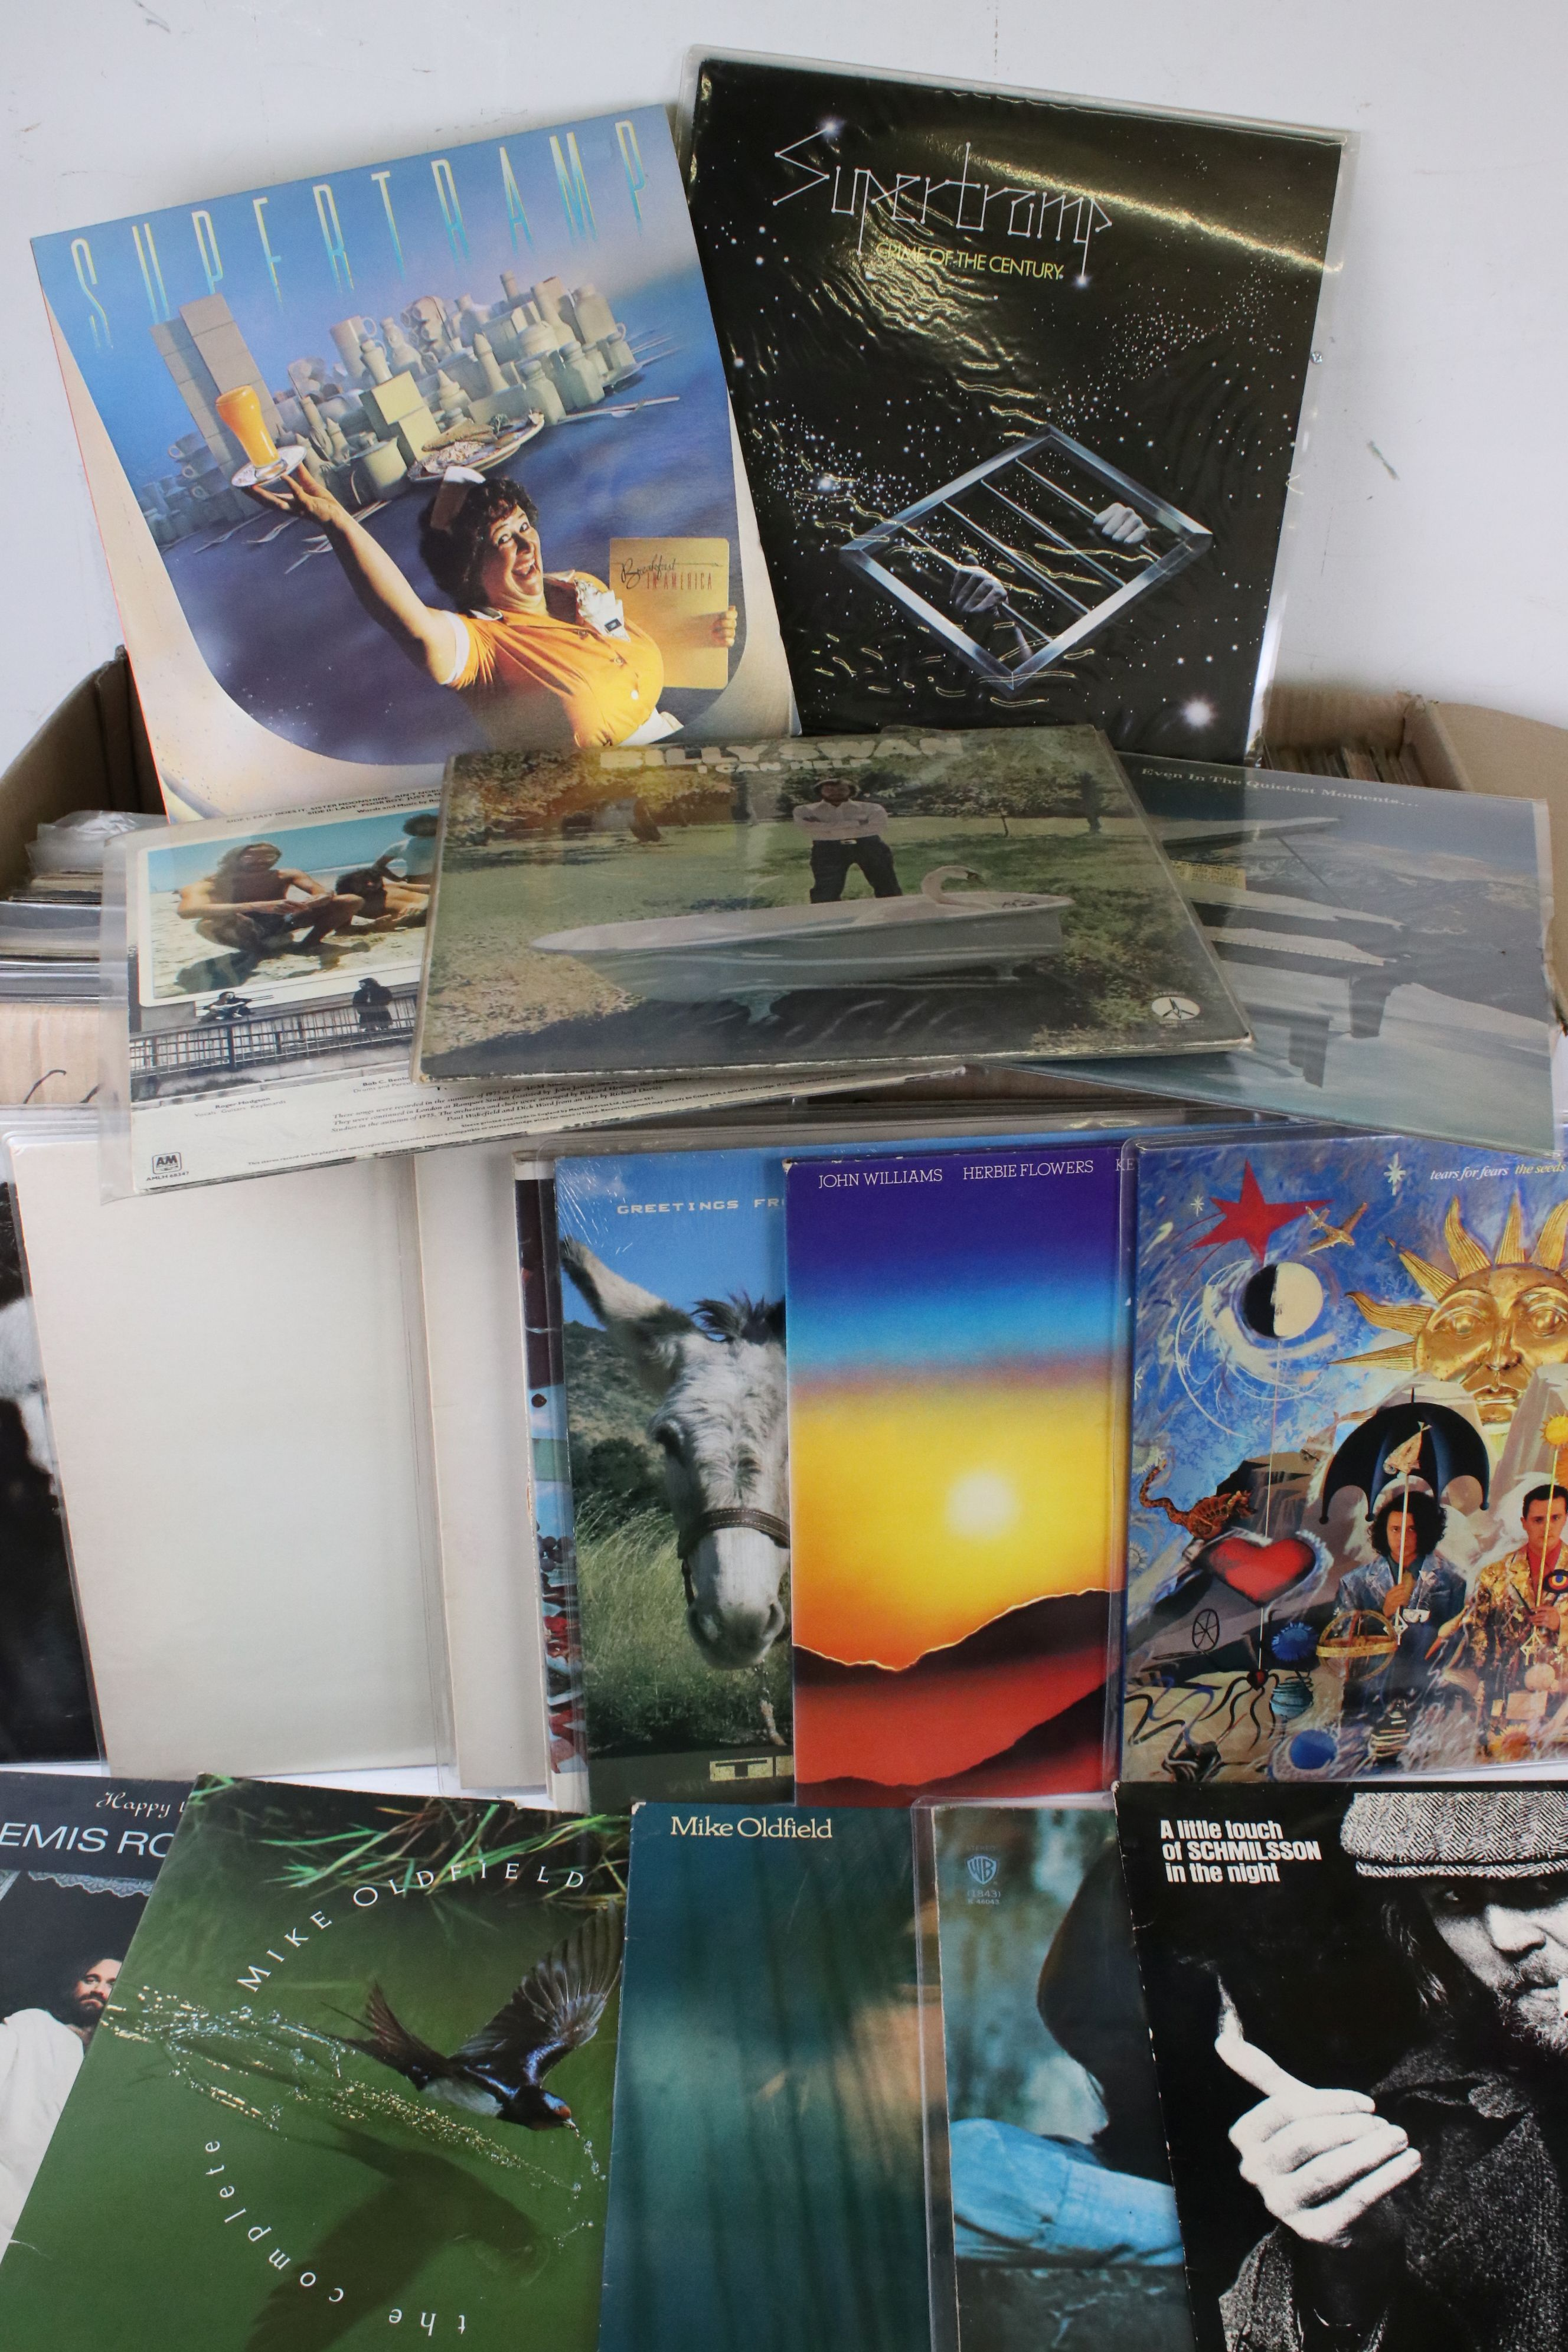 Vinyl - Approx 150 Rock & Pop LP's including Elton John, Fine Young Cannibals, Roxy Music, Sad Cafe,